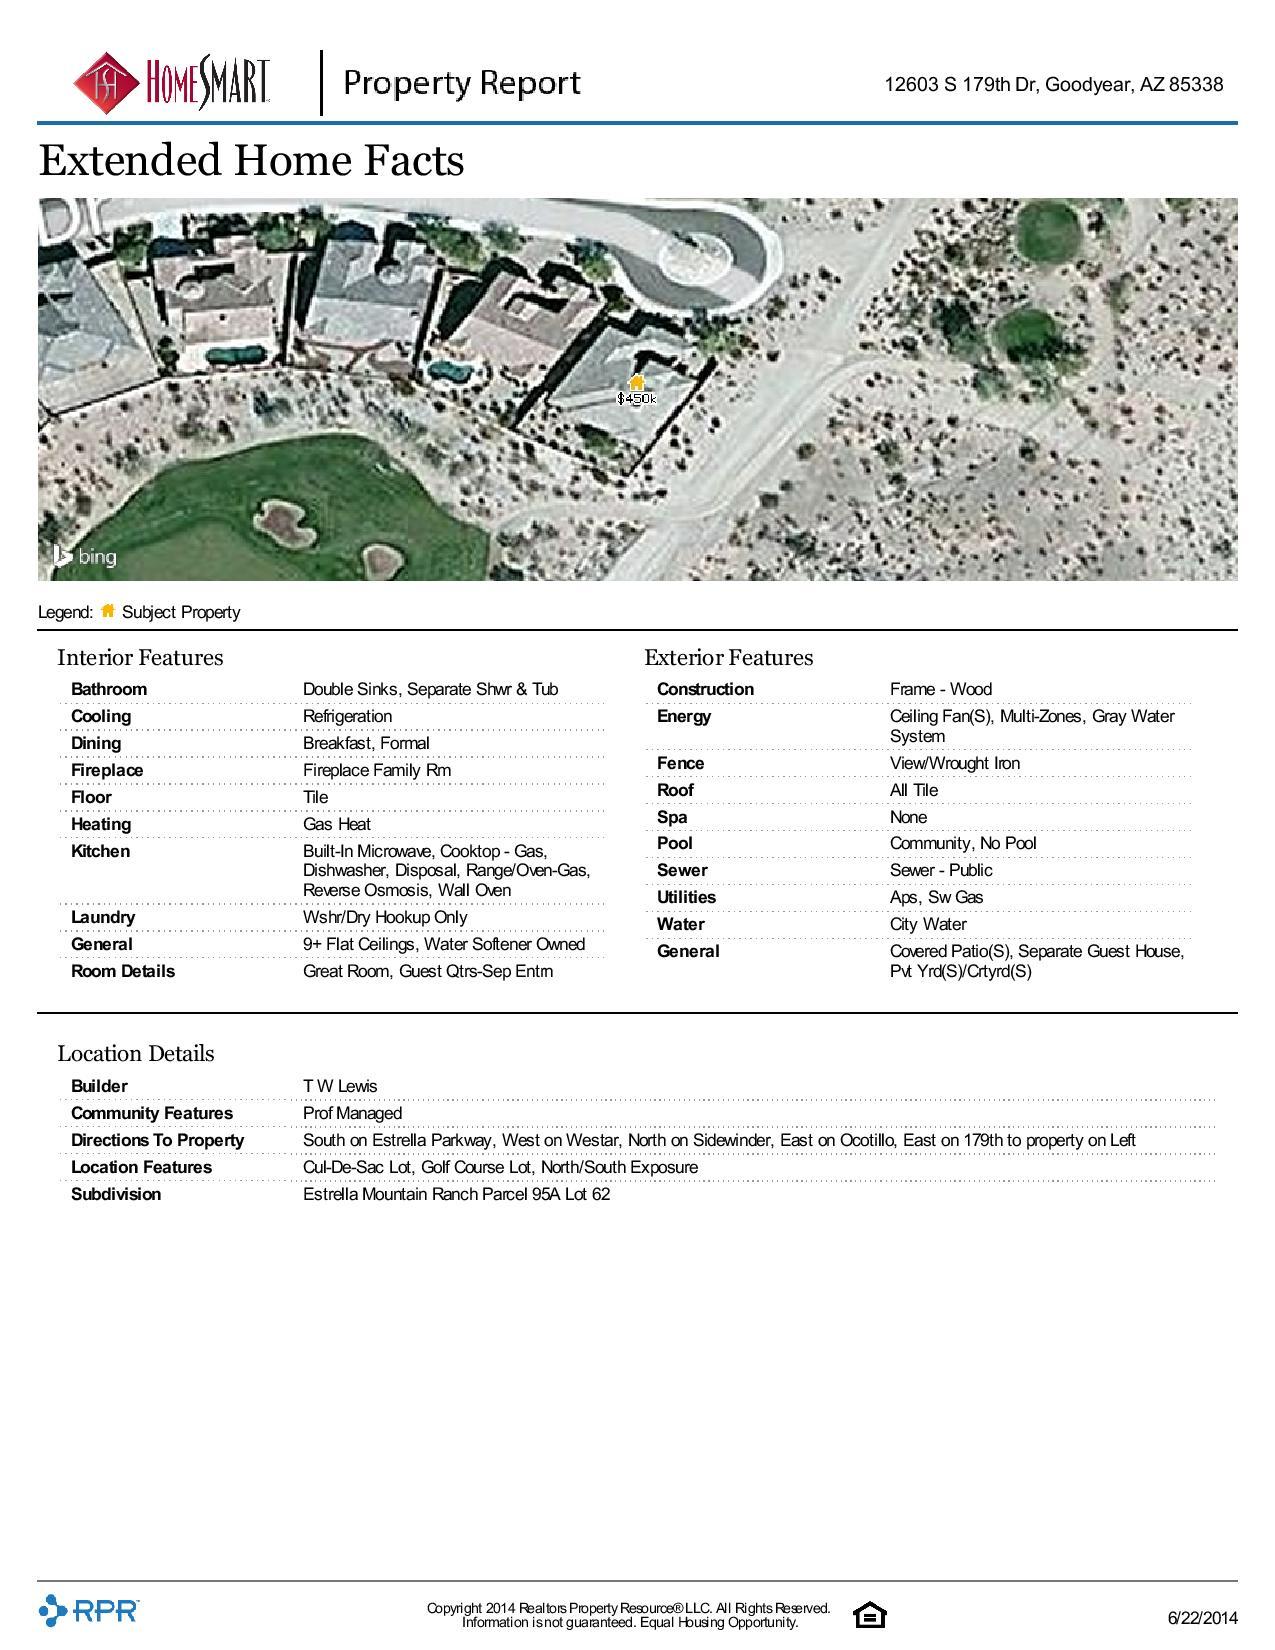 12603-S-179th-Dr-Goodyear-AZ-85338-page-004